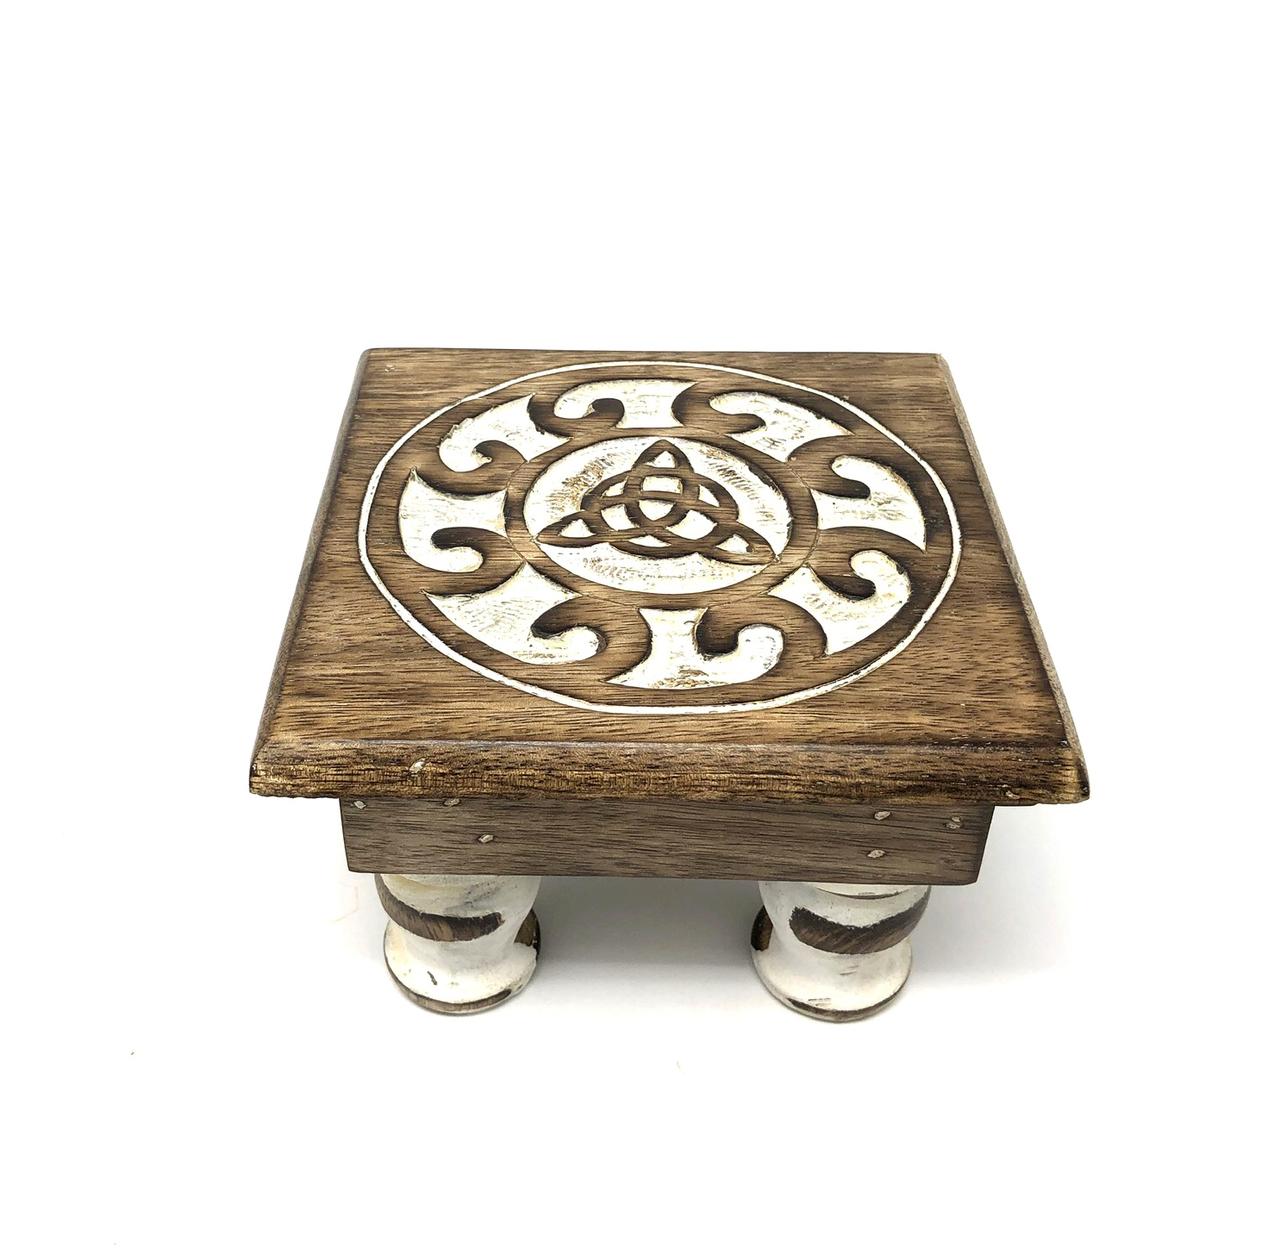 Wood Altar table Triquetra 6x 4 $24.99